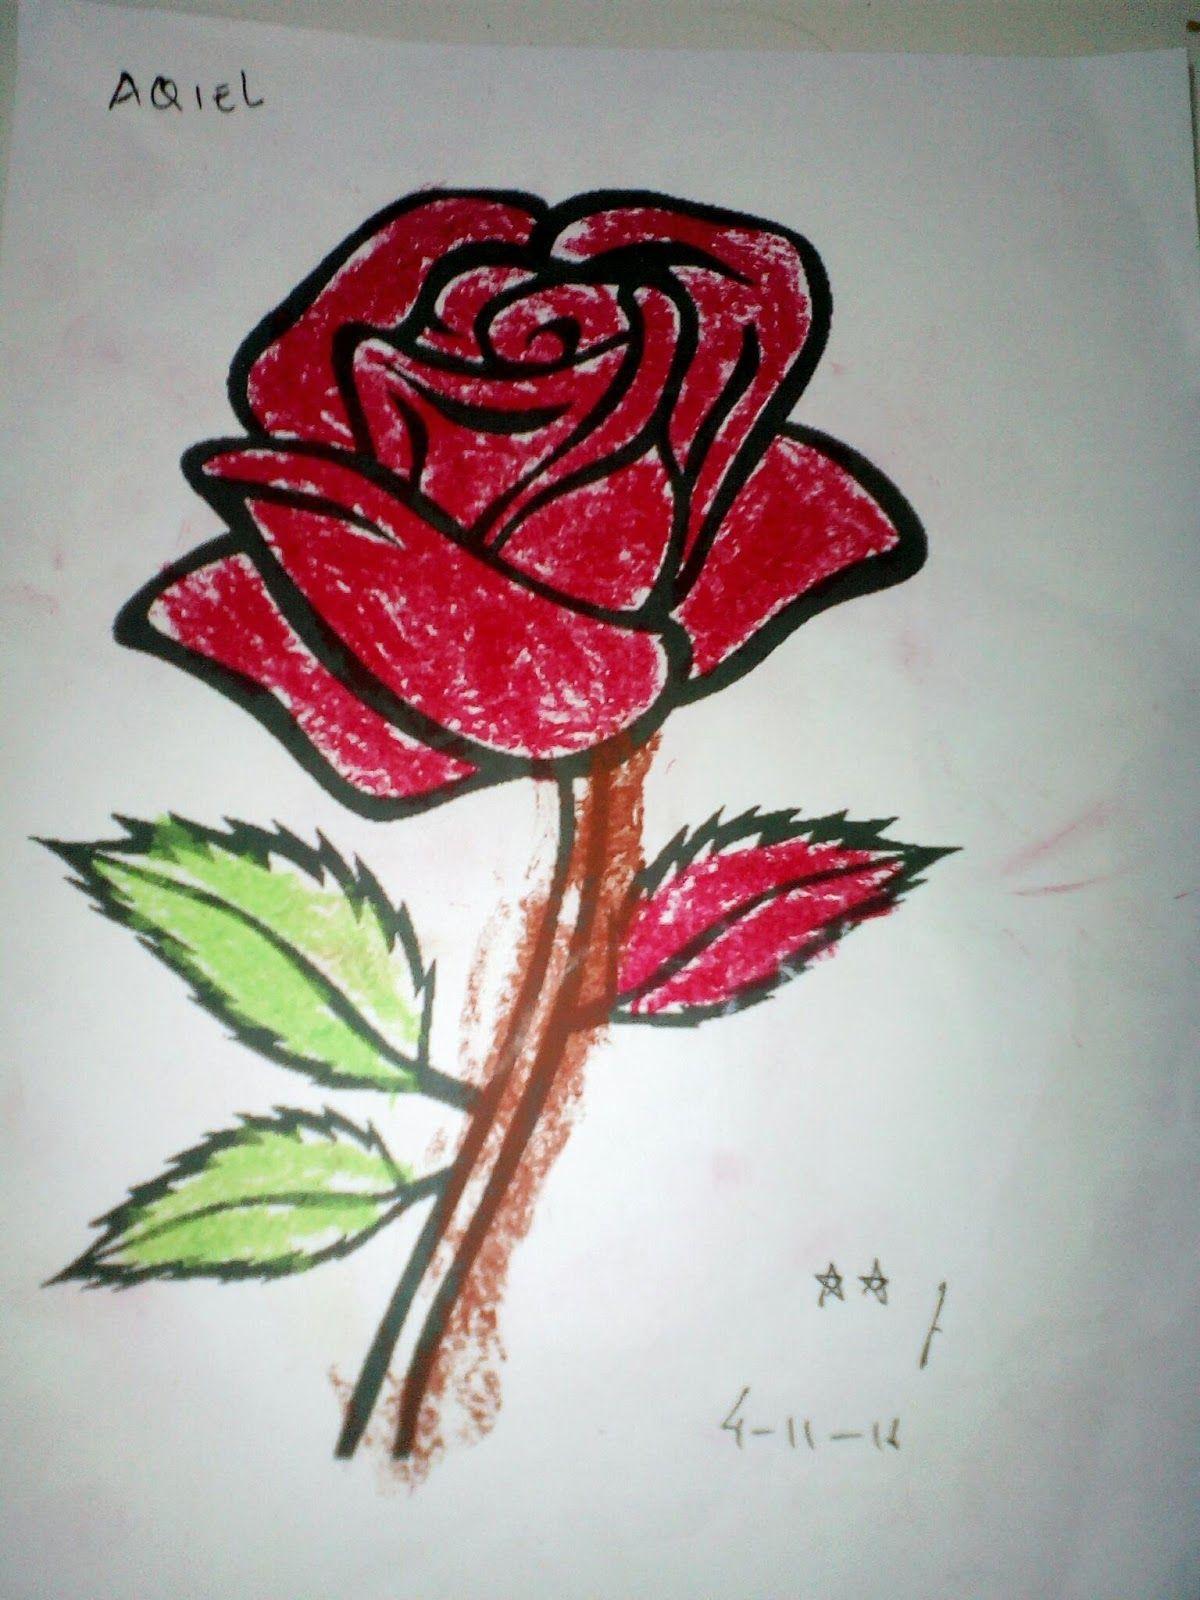 86 Koleksi Cara Membuat Kolase Bunga Mawar Hd Terbaru Kolase Seni Bunga